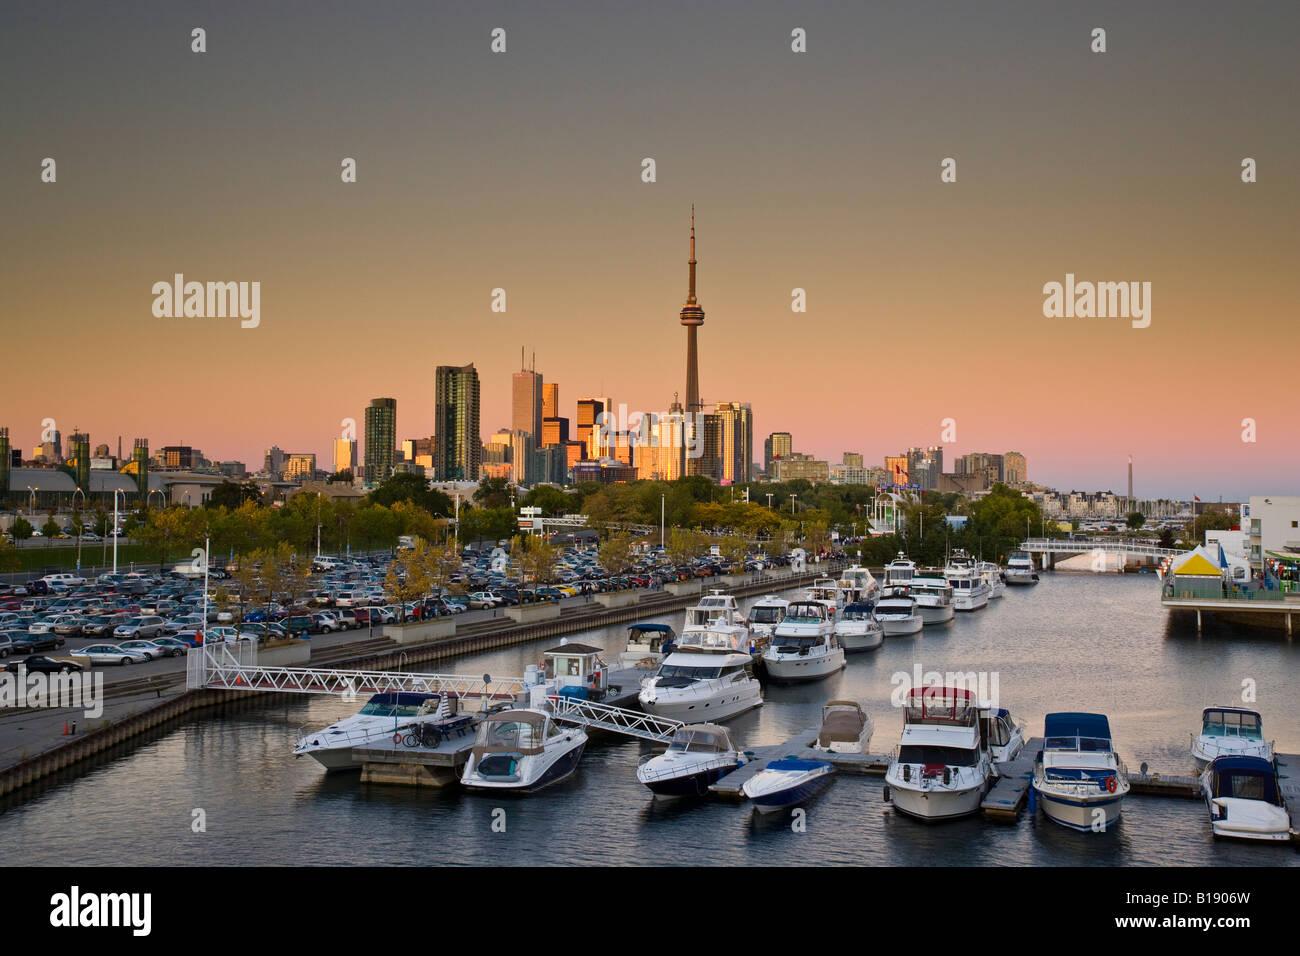 Skyline von Toronto und Ontario Place bei Sonnenuntergang, Toronto, Ontario, Kanada. Stockbild